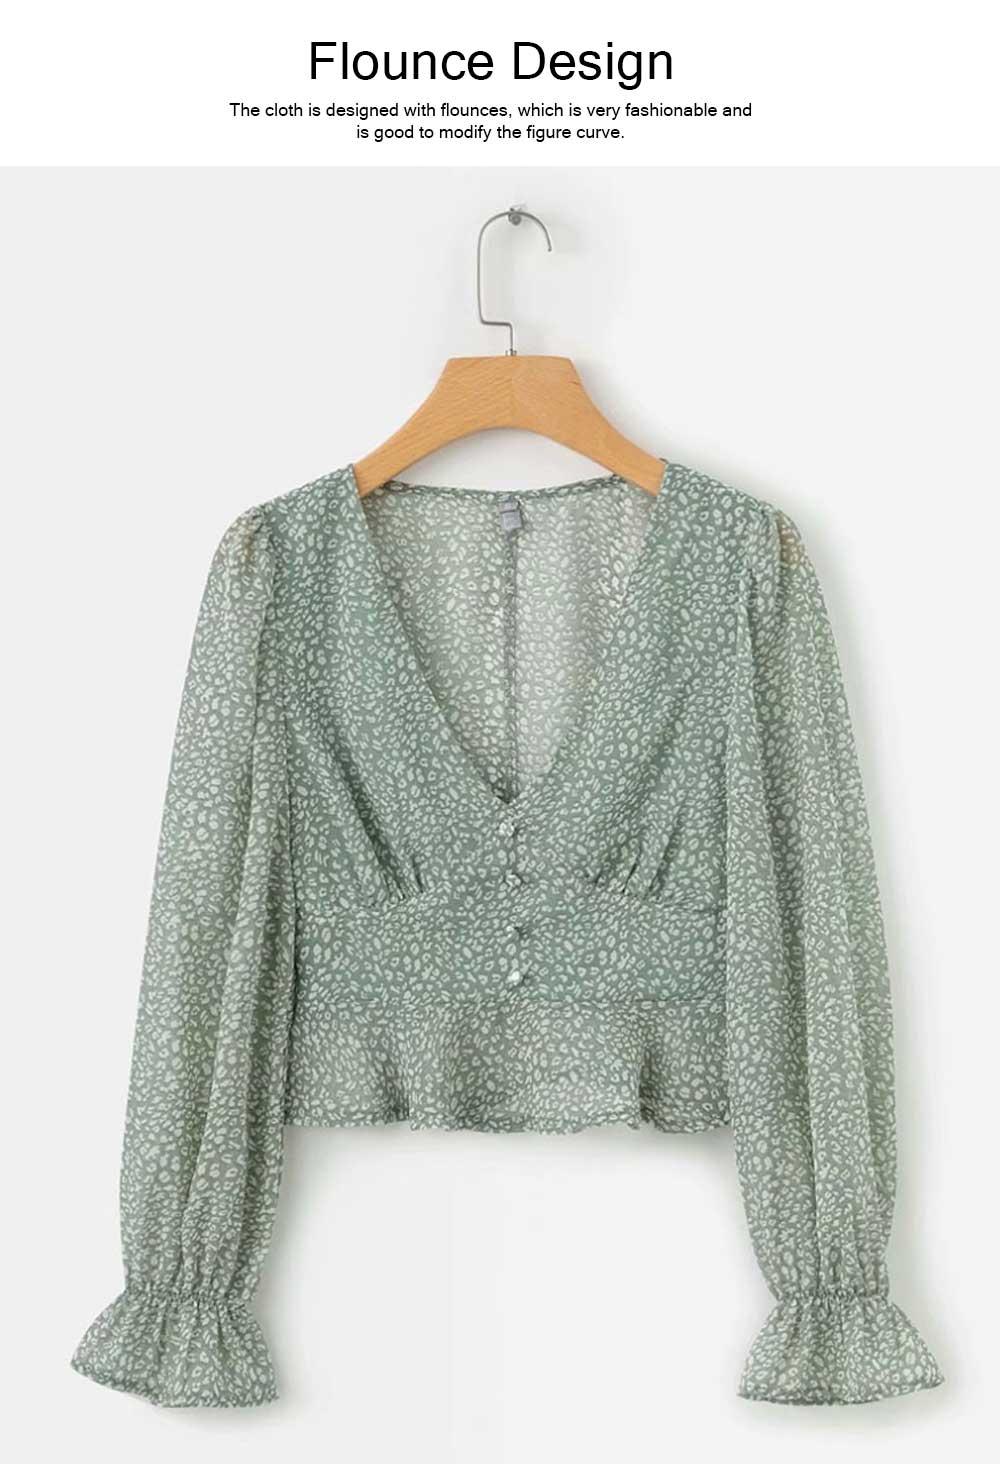 Lady Chiffon Shirt Deep-v Collar Flapper Tops Garment Design Long Sleeve Green Georgette Clothe for Women 4